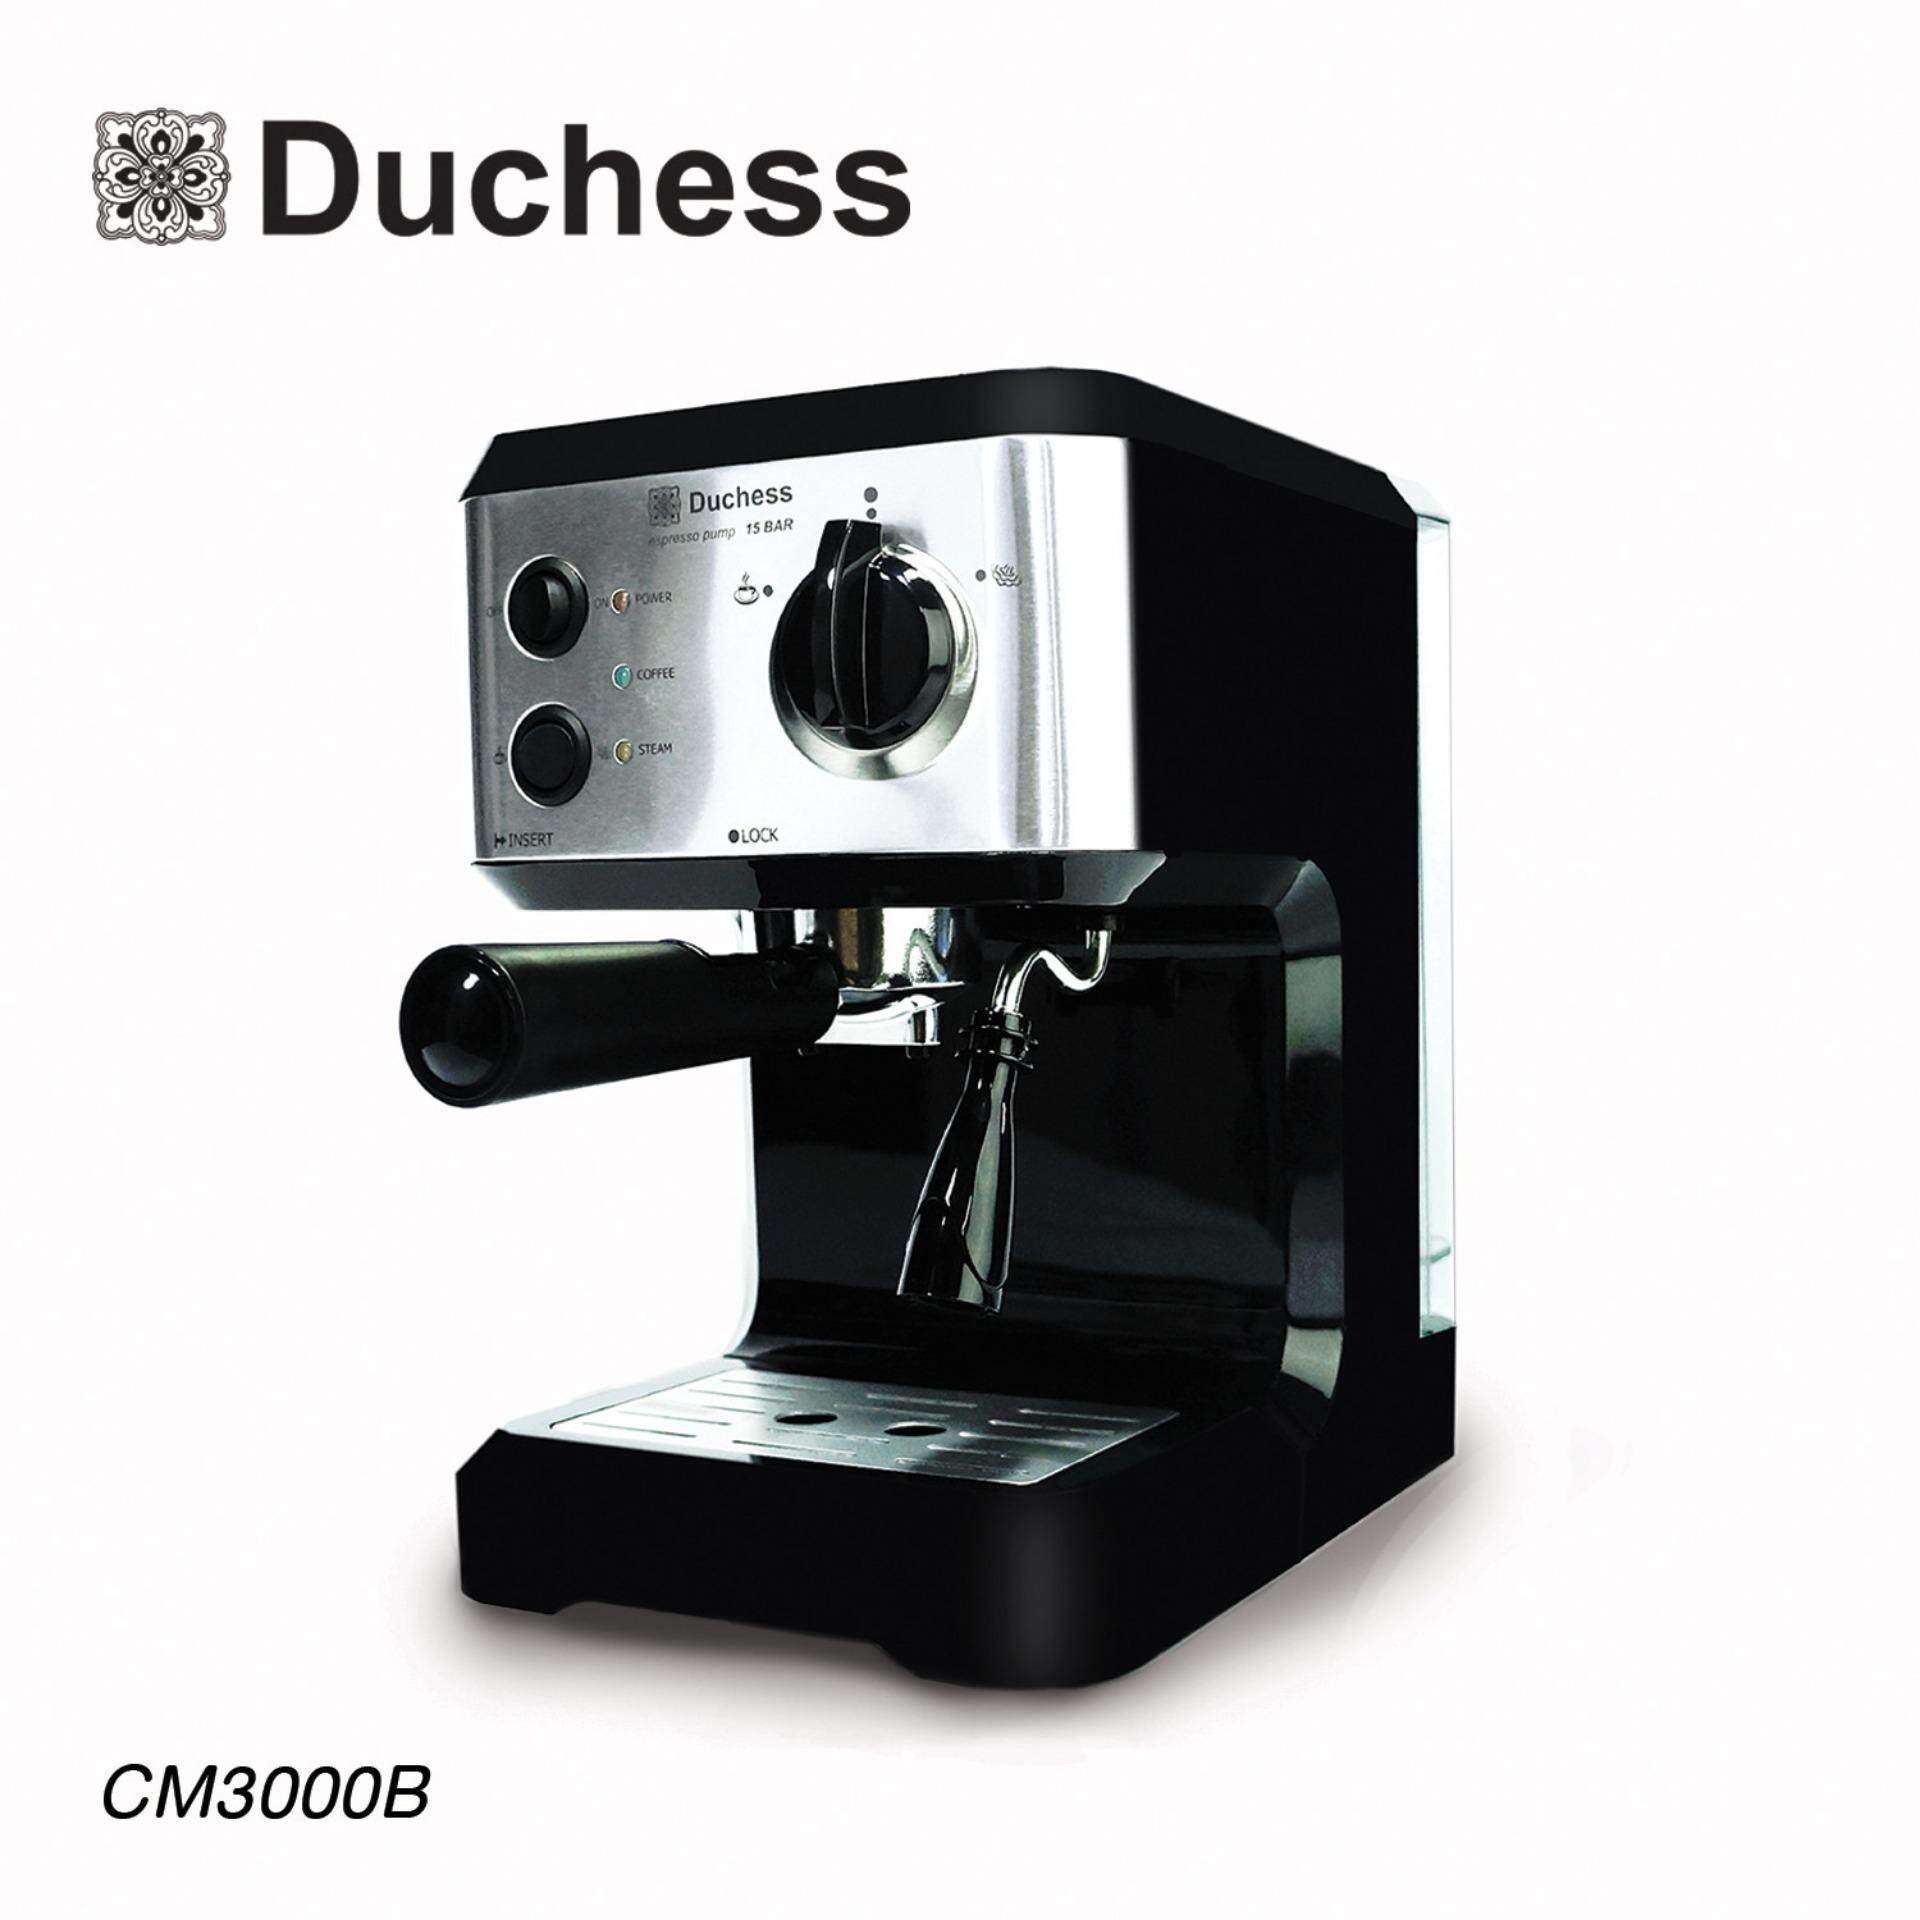 Duchess เครื่องชงกาแฟสด รุ่น CM3000B  - 4d308c798b8897085819cb90ded4f640 - แนะนำเครื่องชงกาแฟชุดเล็ก สำหรับเริ่มต้น